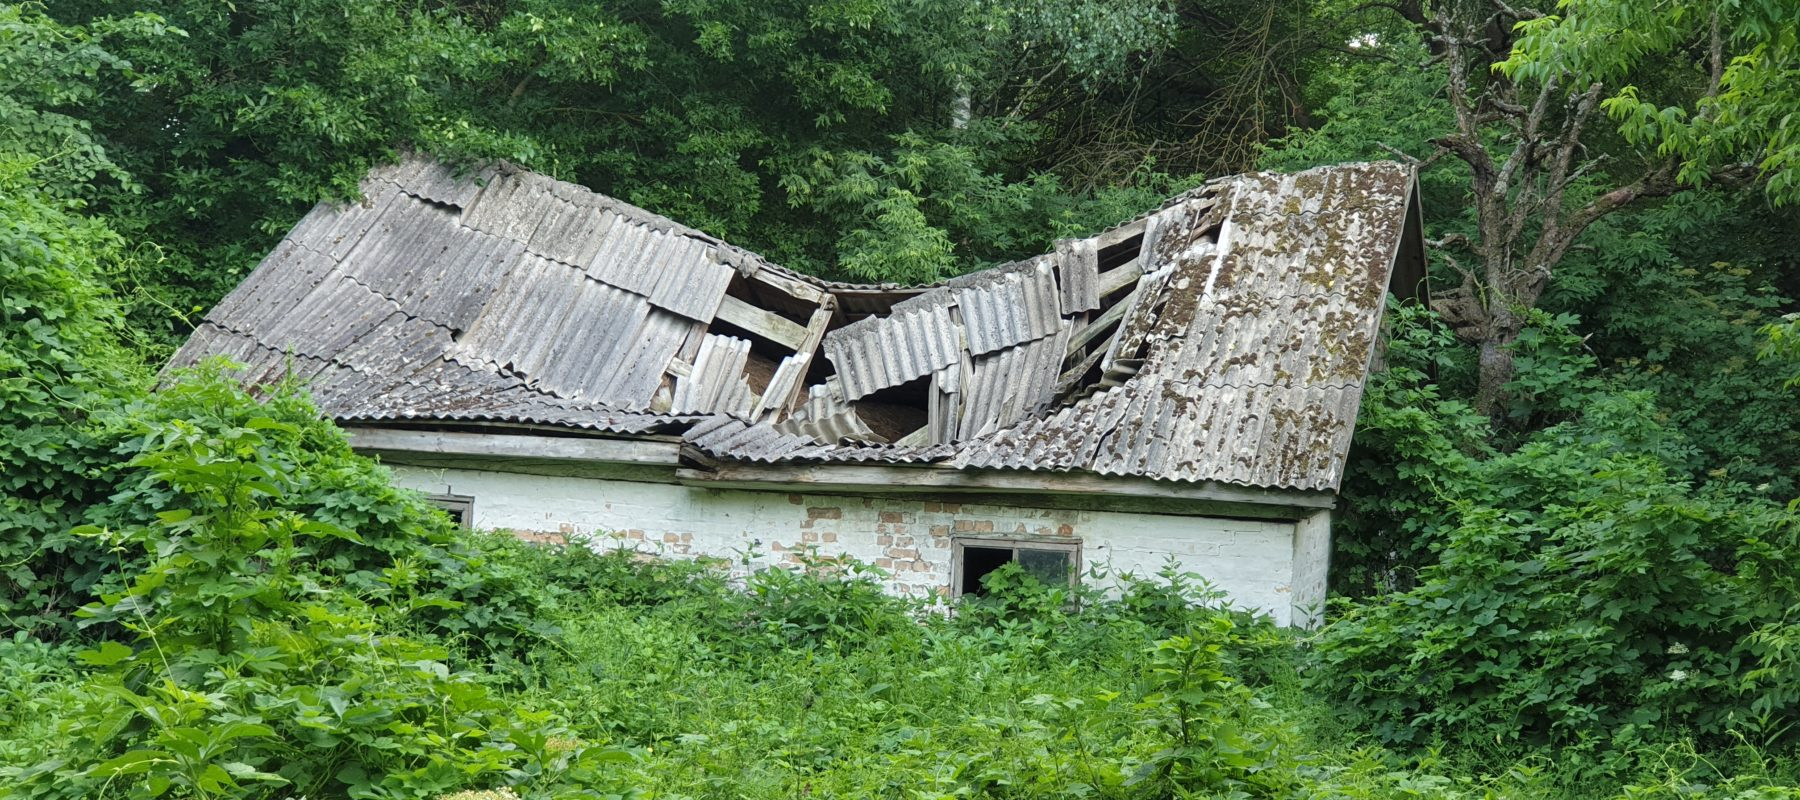 The roof has fallen. Тhe village of Zalissia